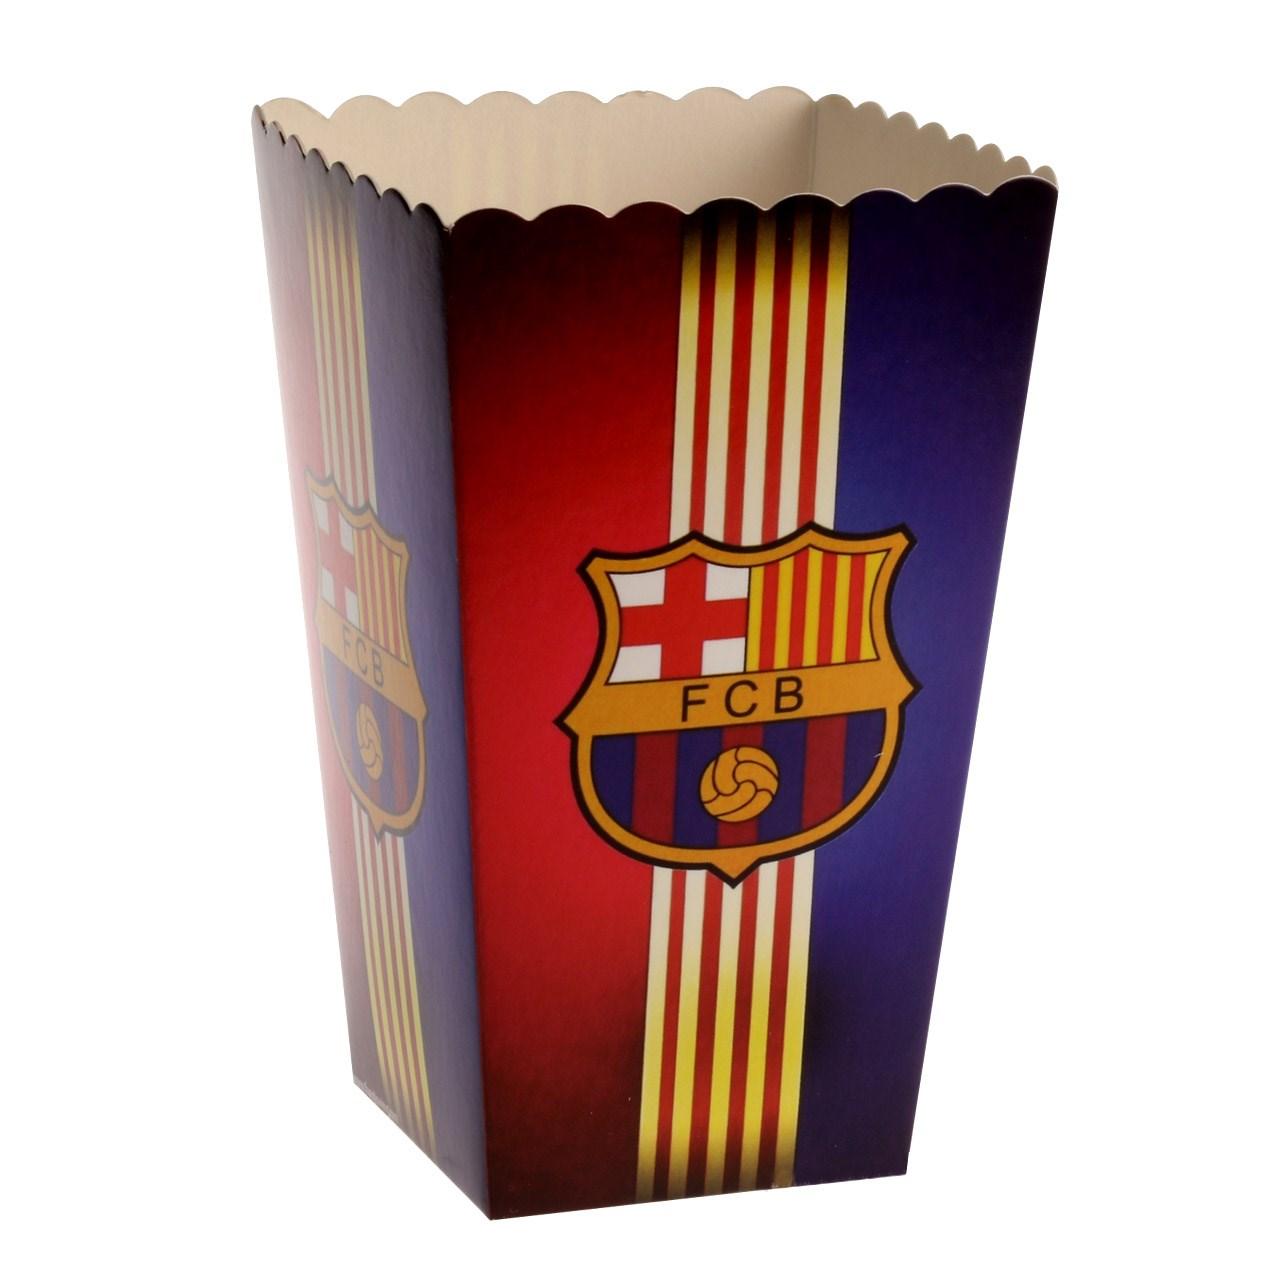 ظرف یکبار مصرف ستاره رنگارنگ مدل بارسلونا  بسته 10 عددی